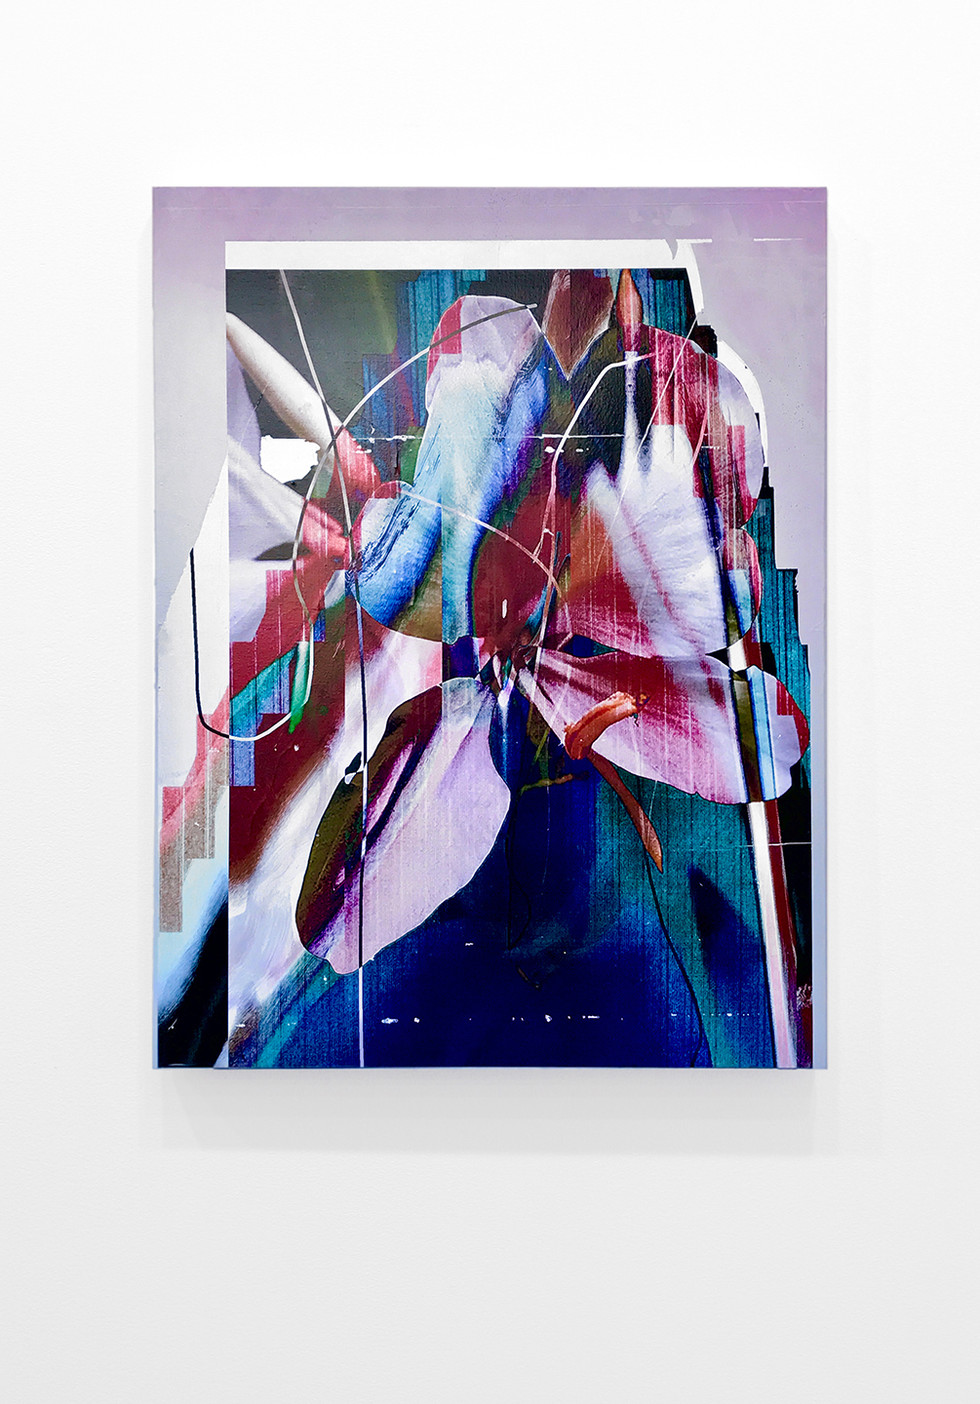 Untitled (Botanica II), 2017